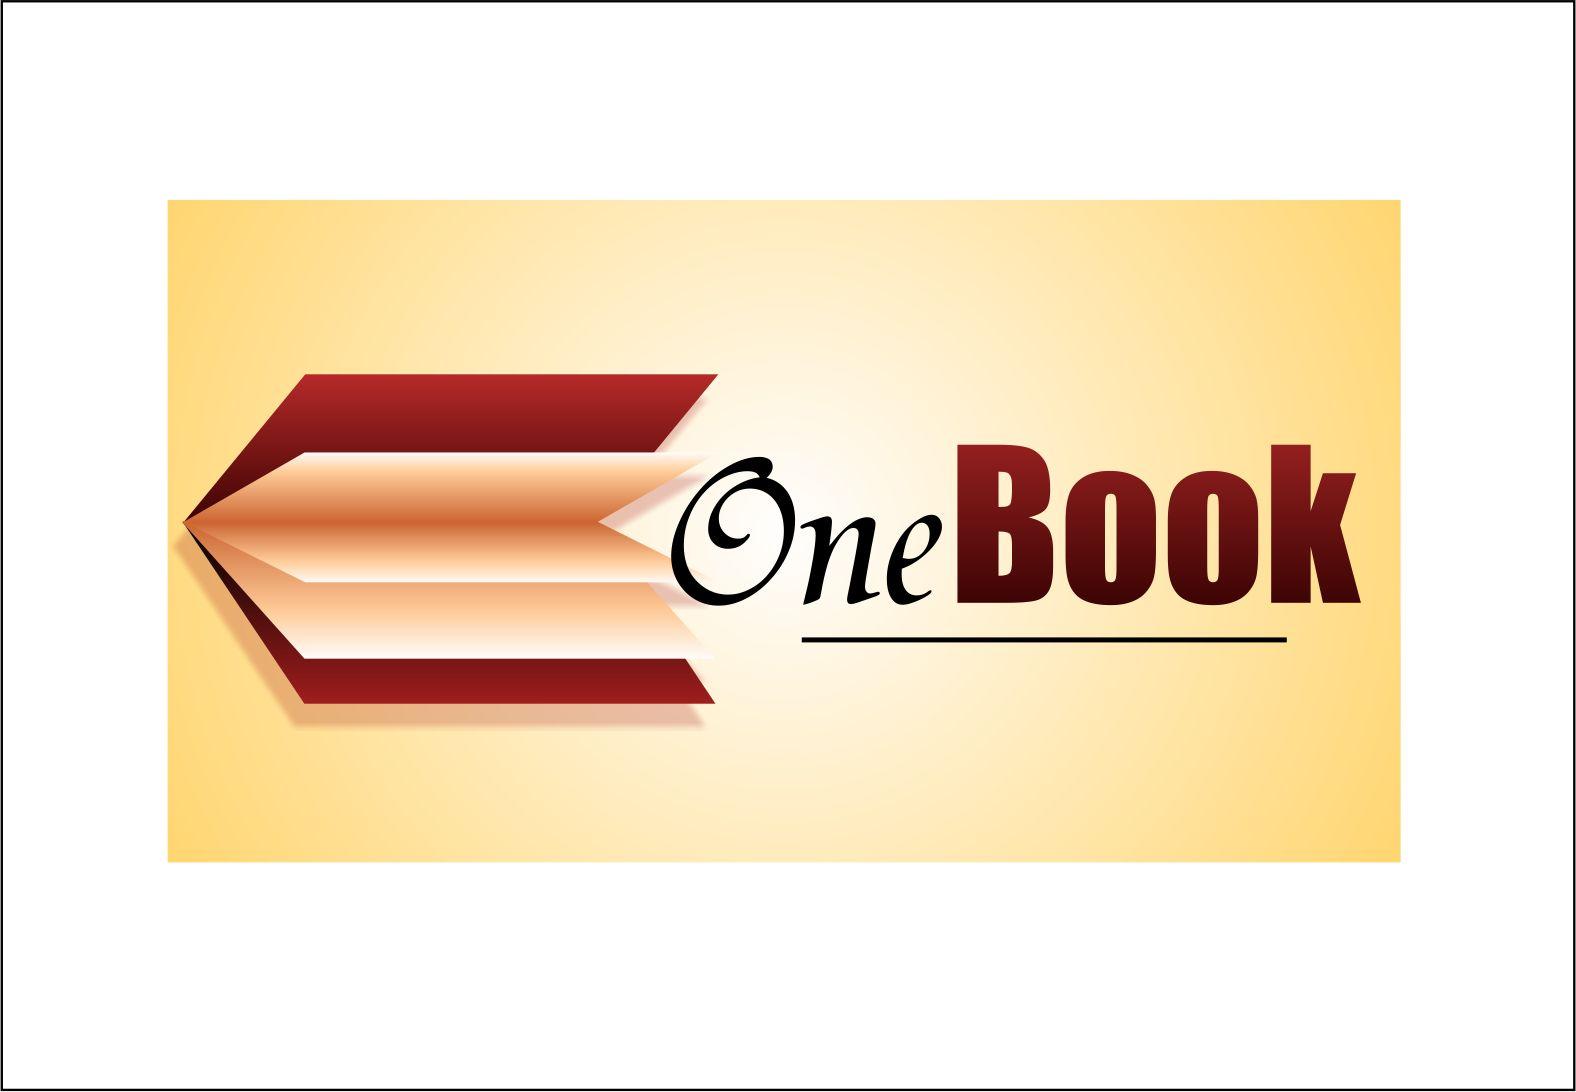 Логотип для цифровой книжной типографии. фото f_4cbeebd659b73.jpg